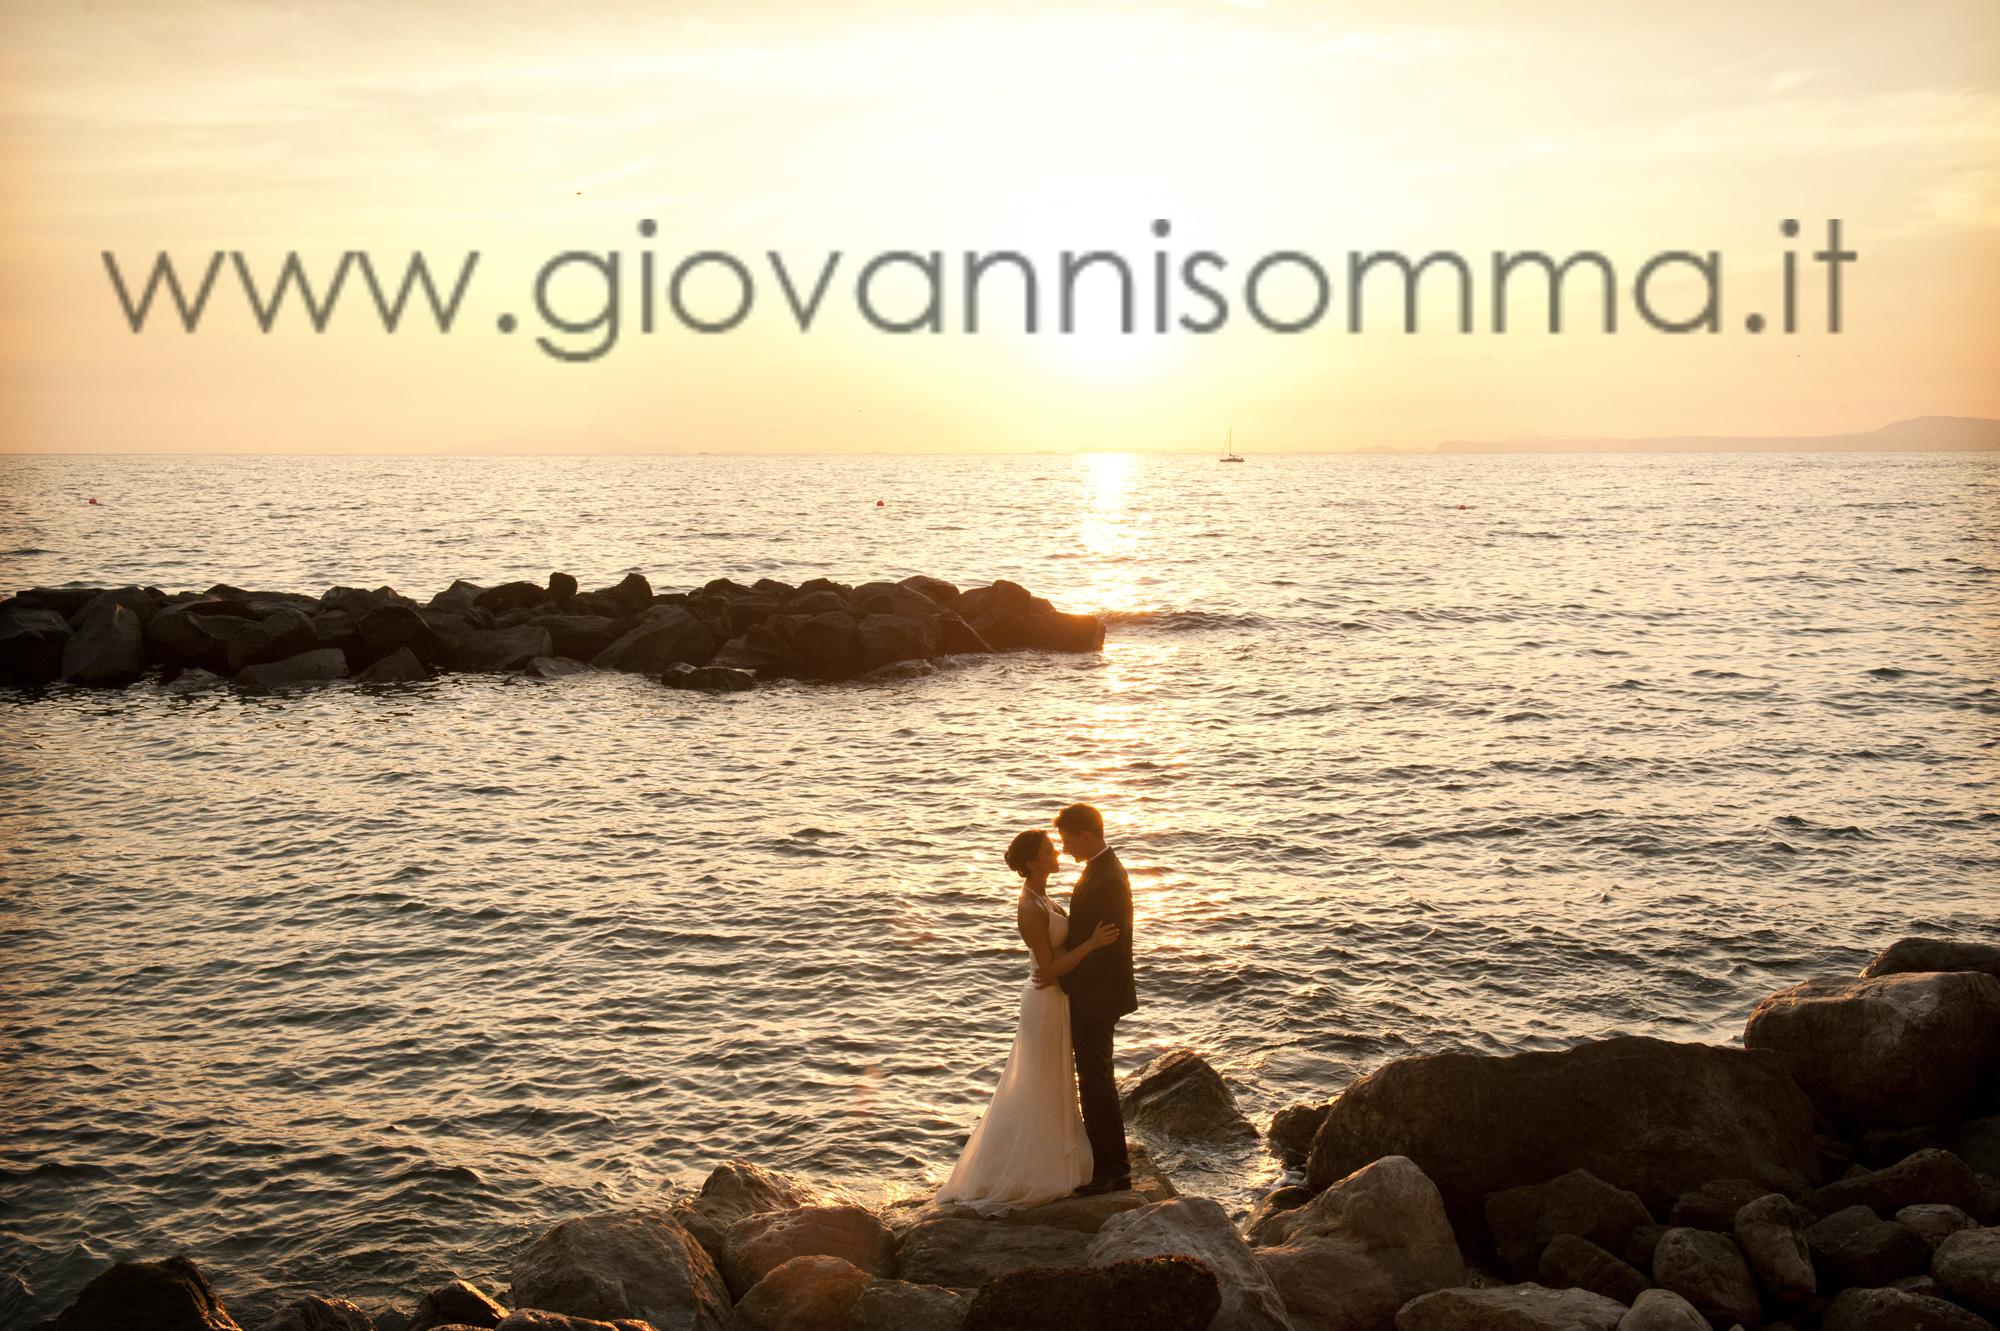 Matrimonio In Spiaggia Costiera Amalfitana : Matrimonio in spiaggia sposarsi al mare le location più